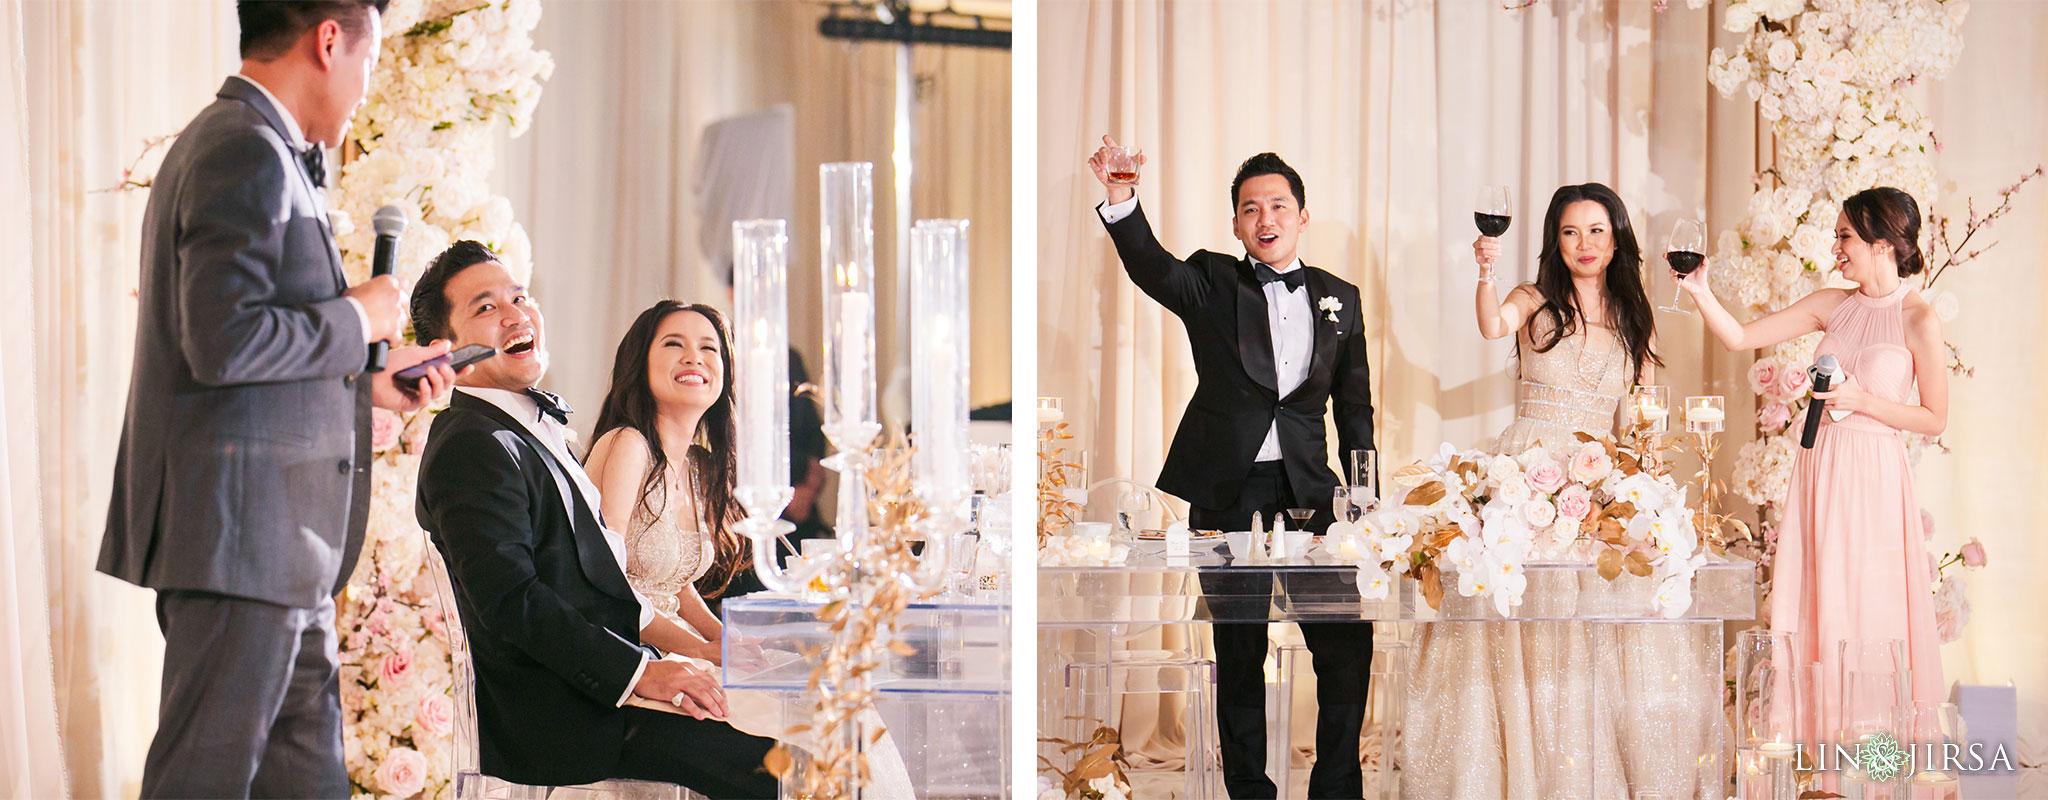 036 hilton costa mesa orange county vietnamese wedding photography